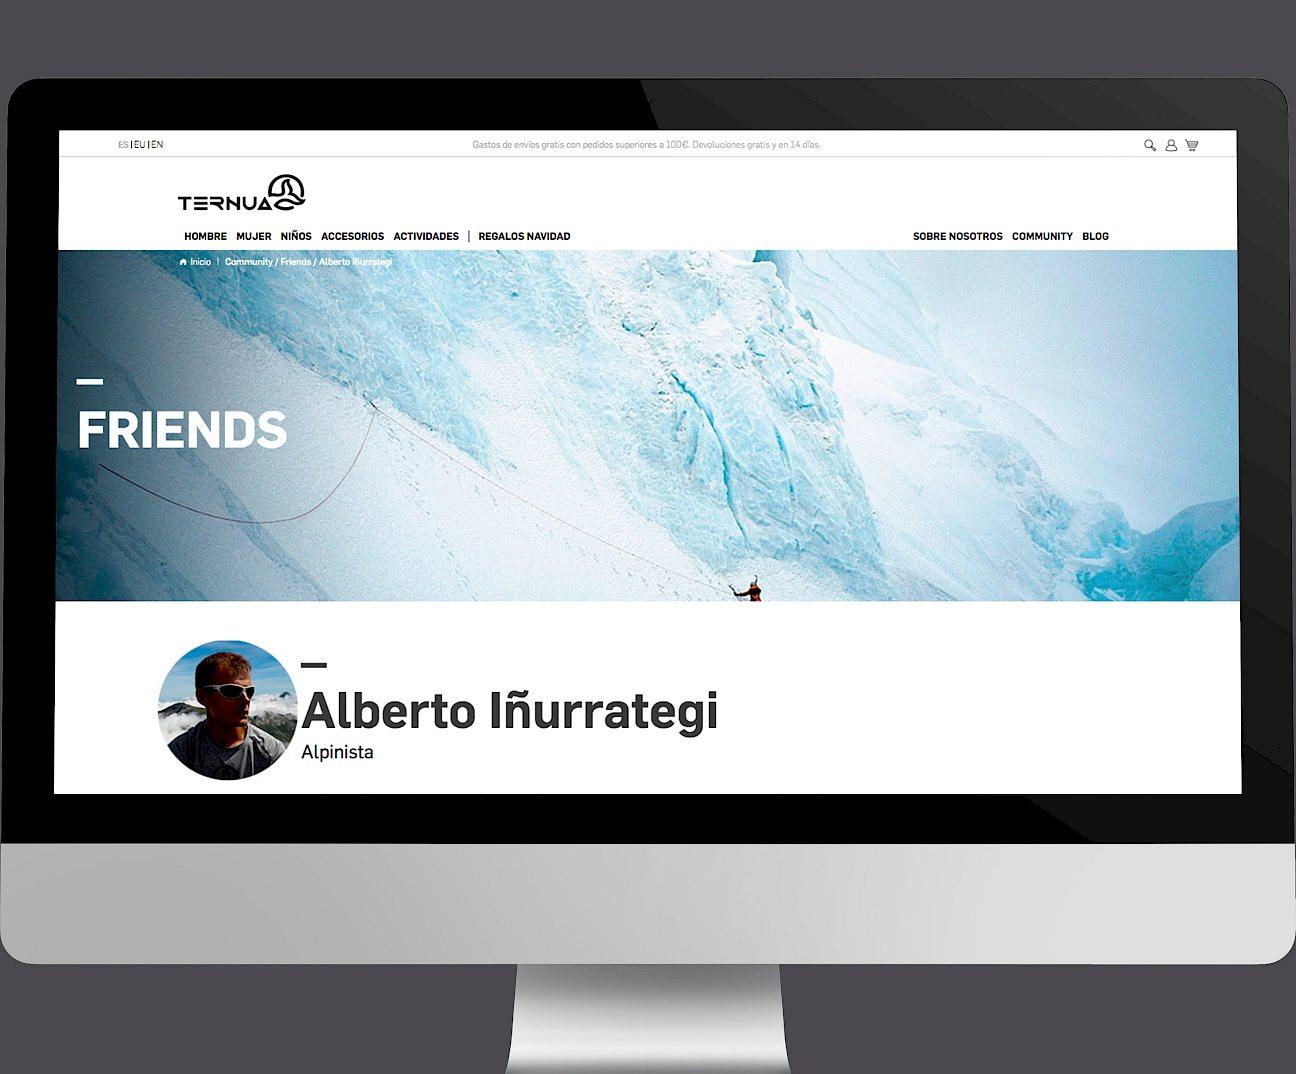 wireframe move ternua website digital 10 design branding